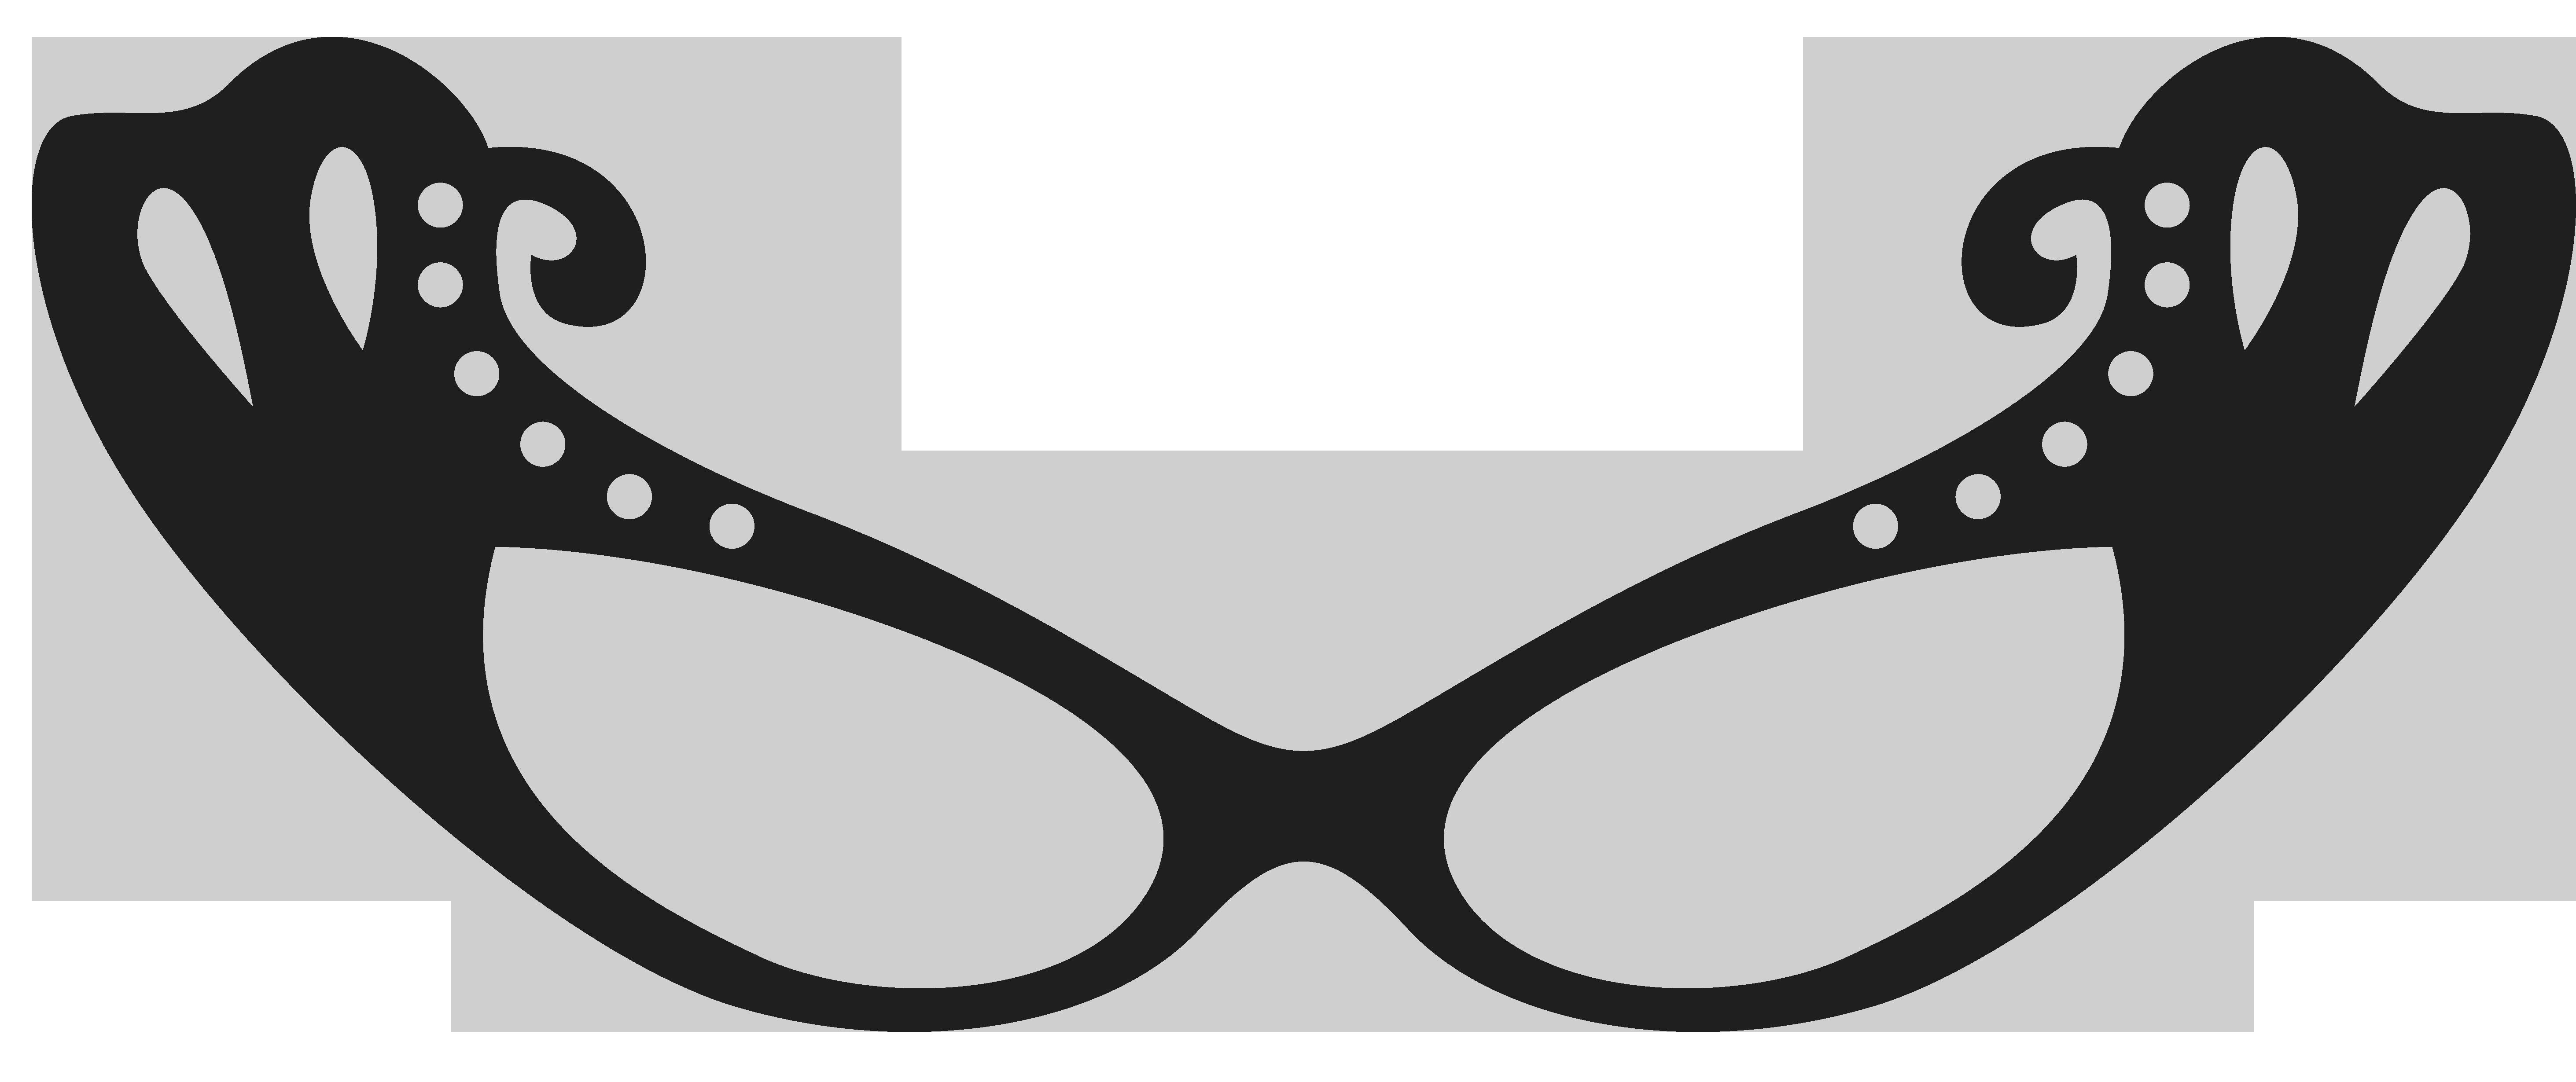 Glasses Clipart & Glasses Clip Art Images.